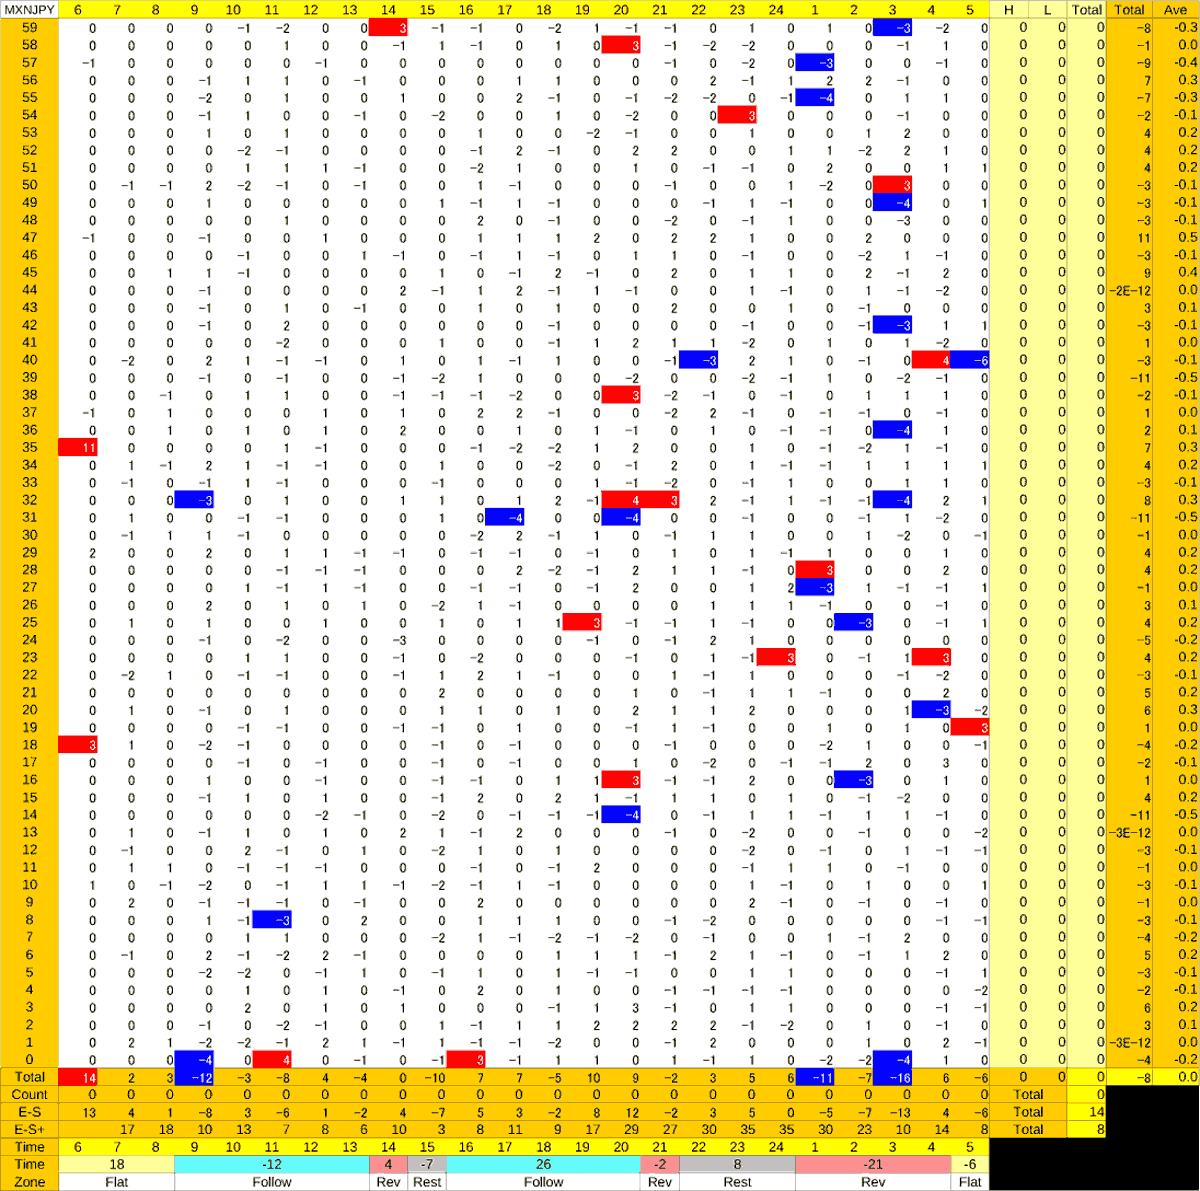 20200716_HS(3)MXNJPY